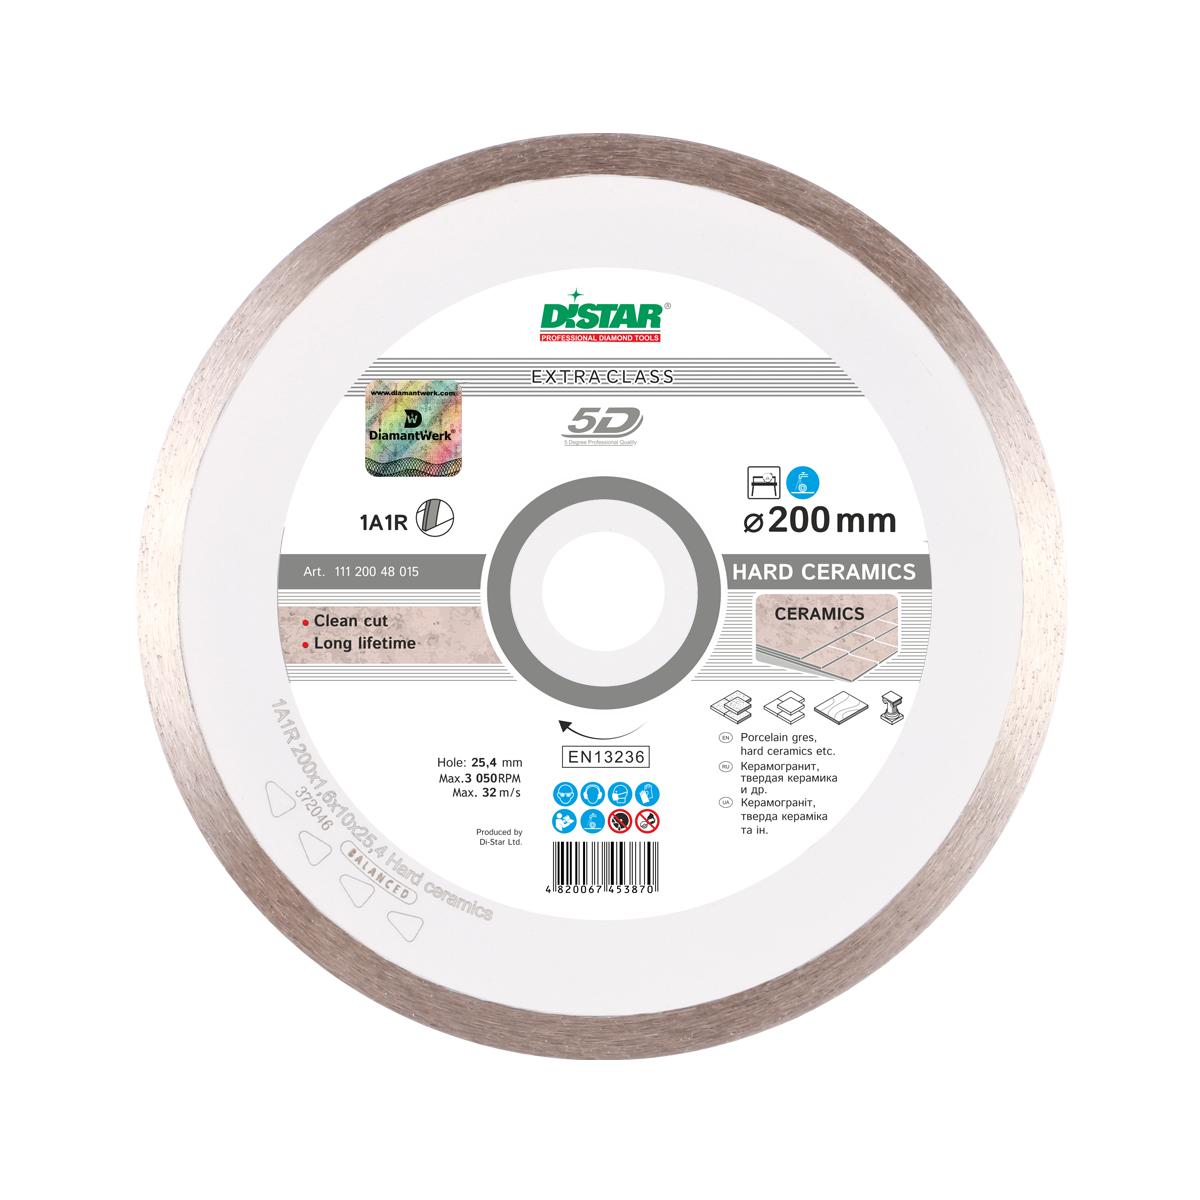 Круг алмазный Distar 1A1R 350x2,2x10x32 Hard ceramics